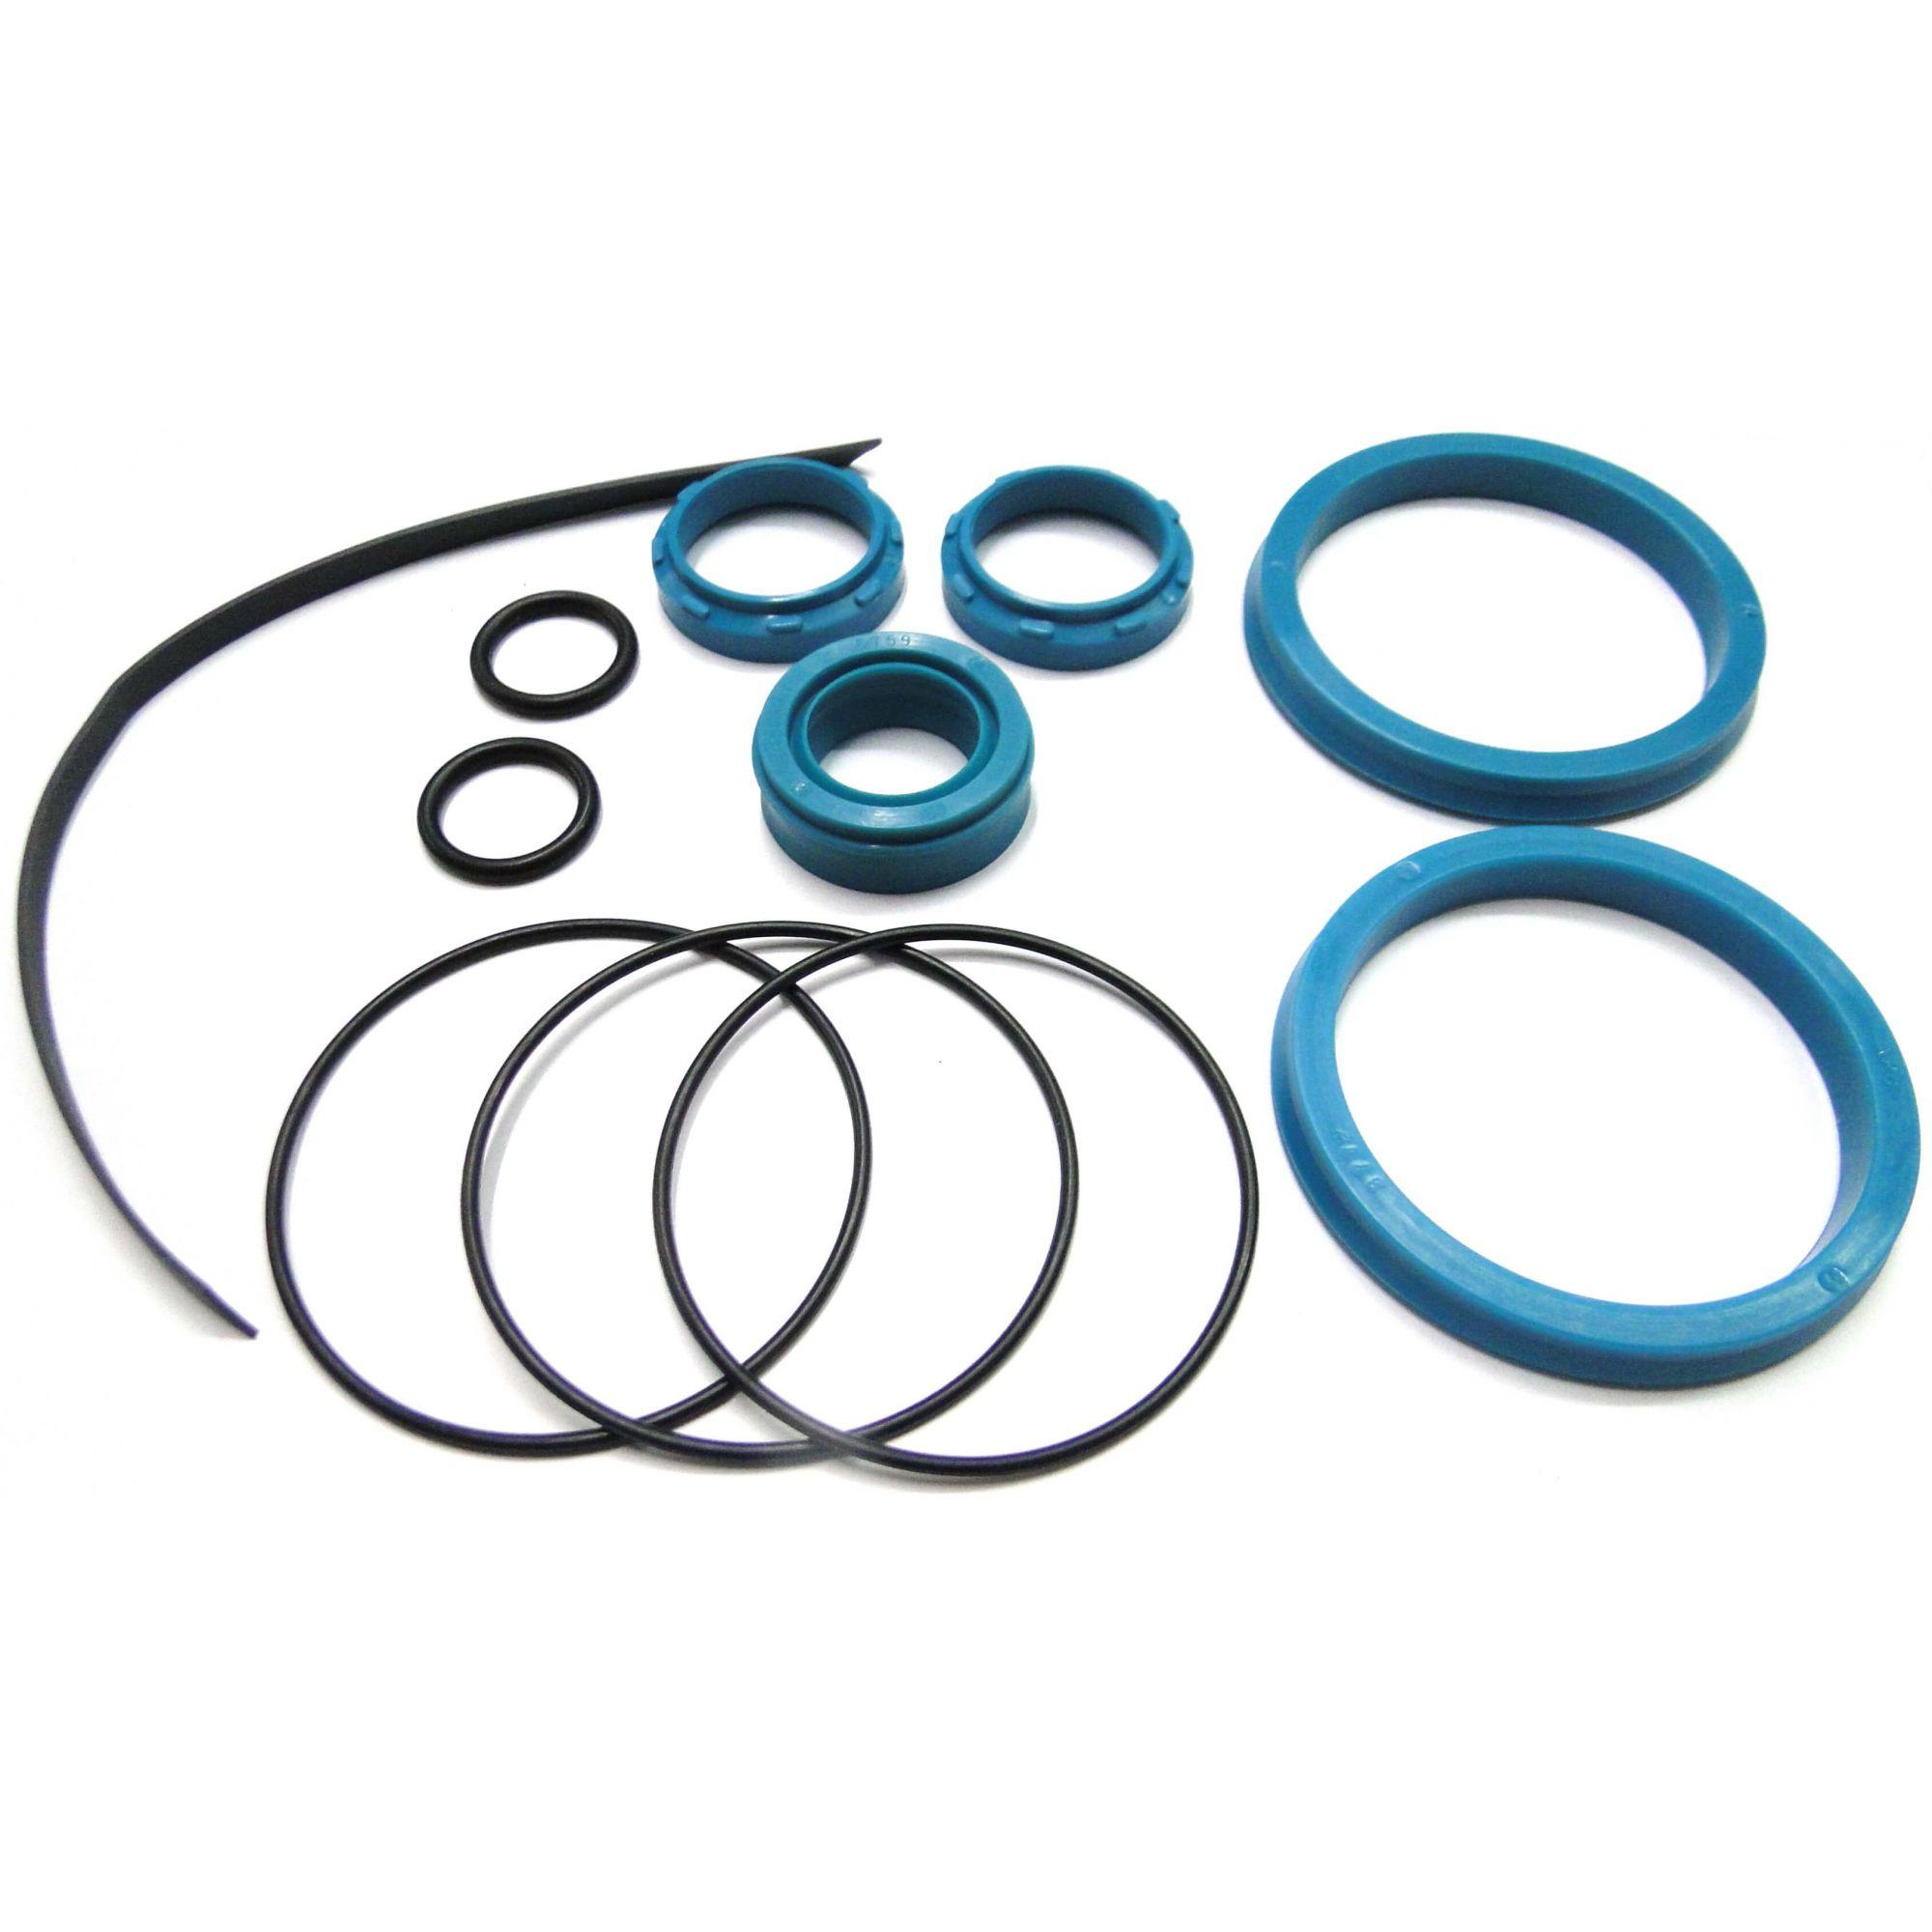 Kit Reparo para Cilindro Pneumático Haste Simples E063 Werk Schott